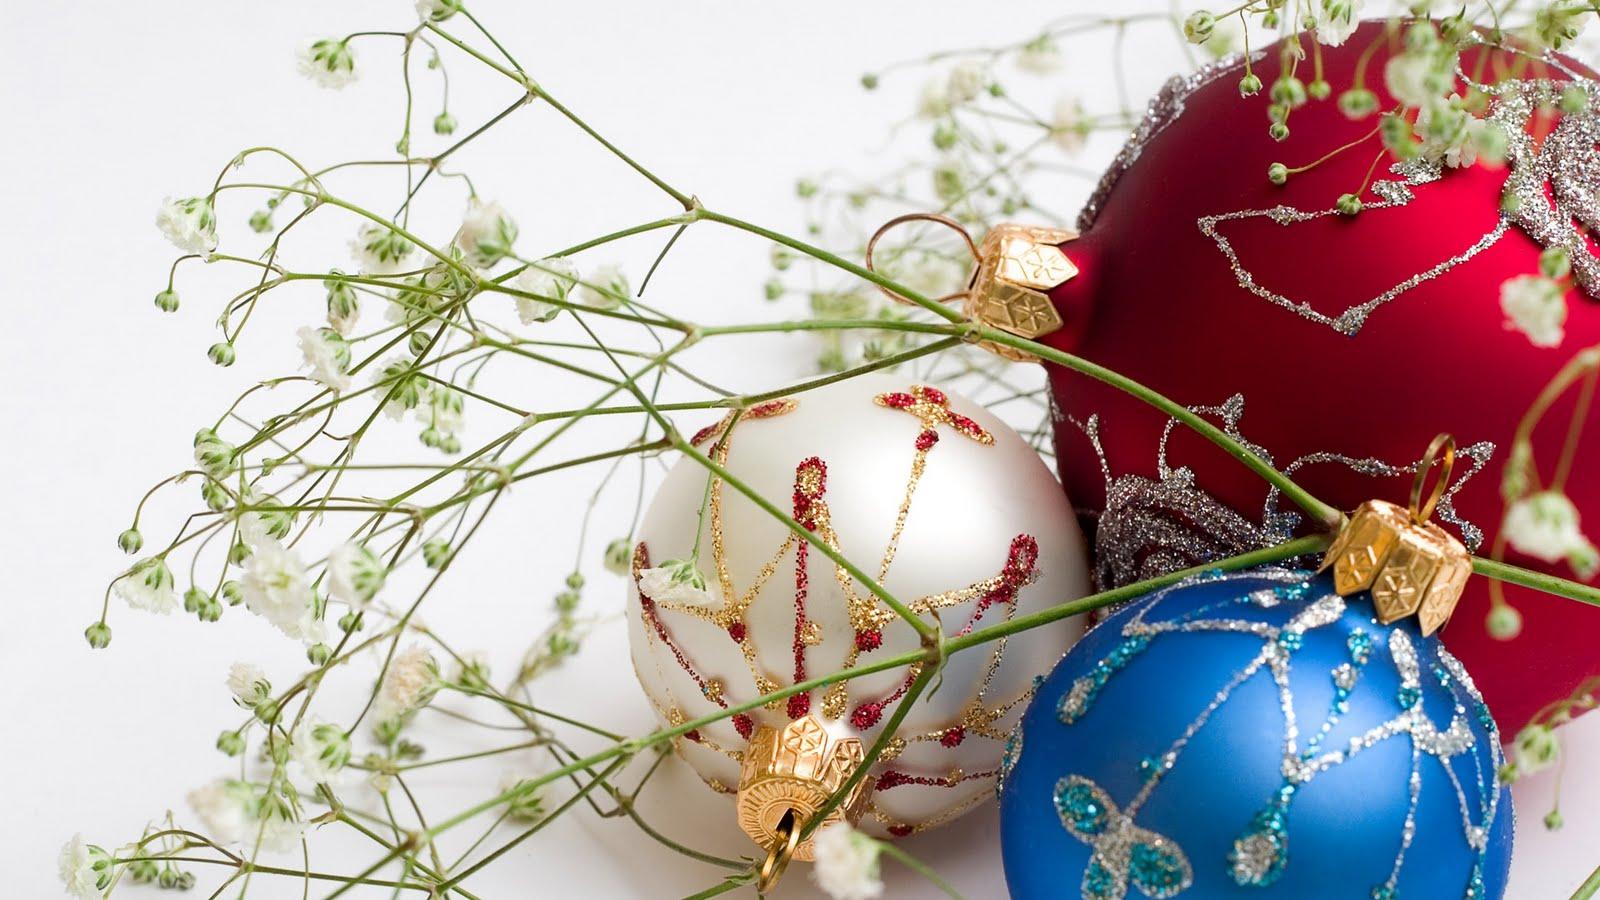 christmas ornaments wallpaper 8026 - photo #25